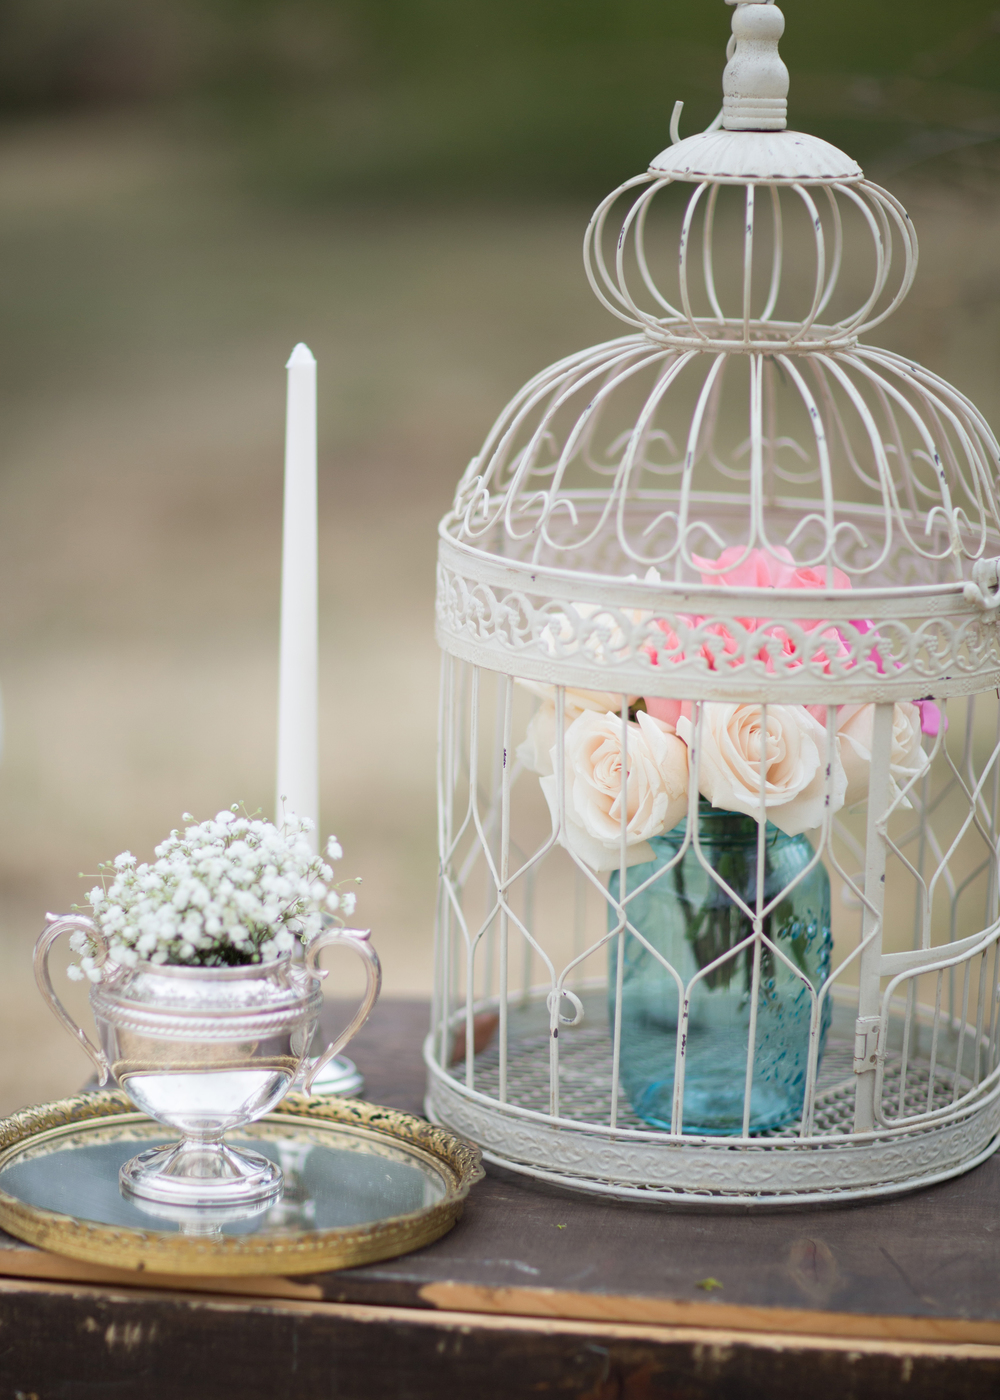 Birdcage, Mason Jars, Vintage mirror